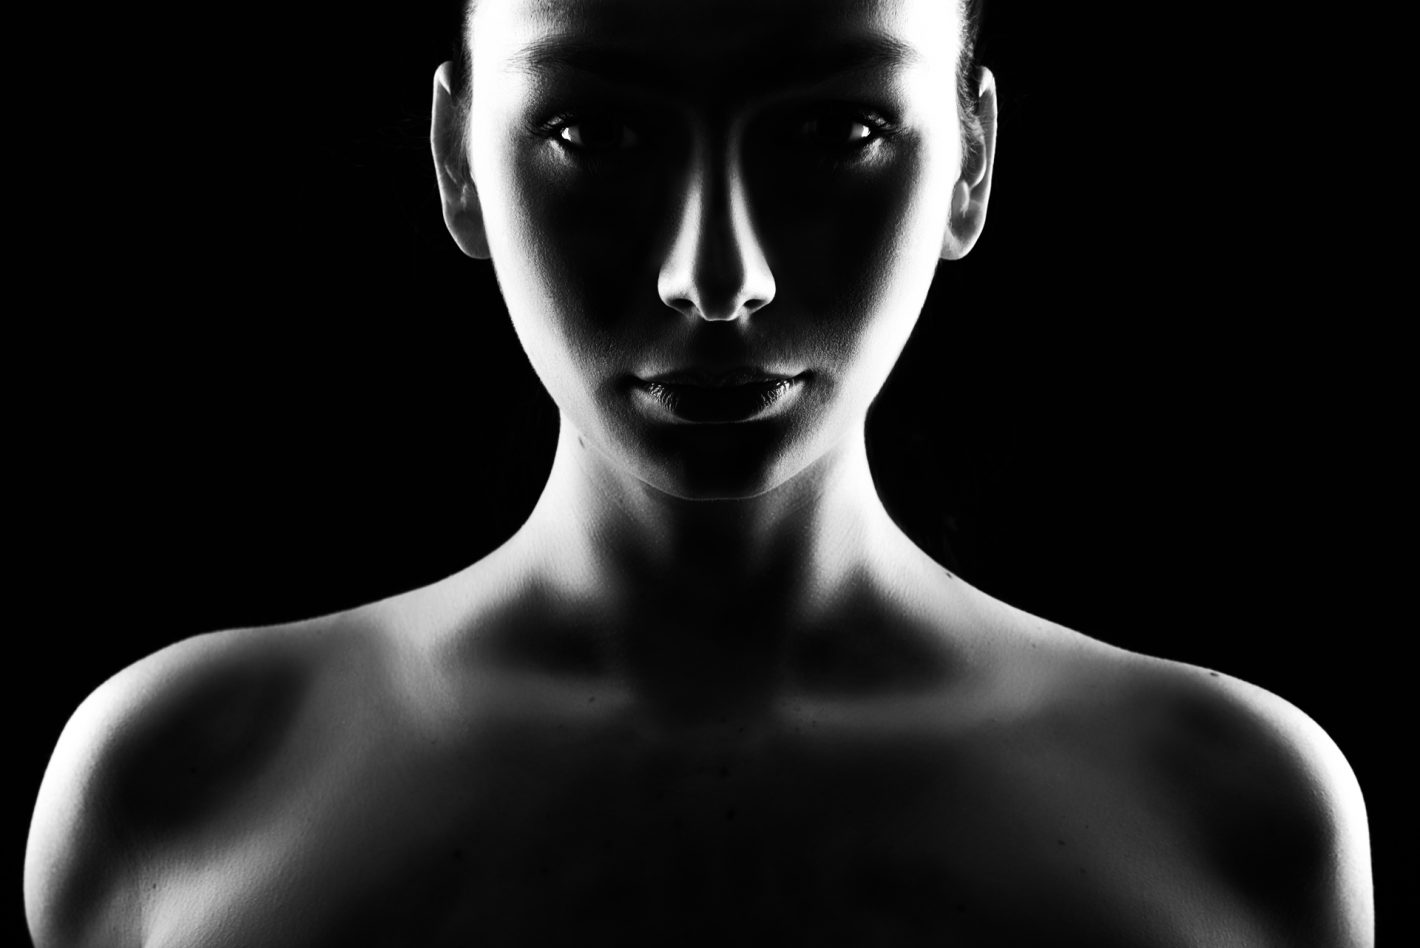 Nikon Clair-Obscur N°1 - Nicolas Dumas - « Dark Beauty » (Nikon D750, Nikkor 24-70 f/2.8 E, 55mm, 1/200 à f/ 9.0, ISO 100)